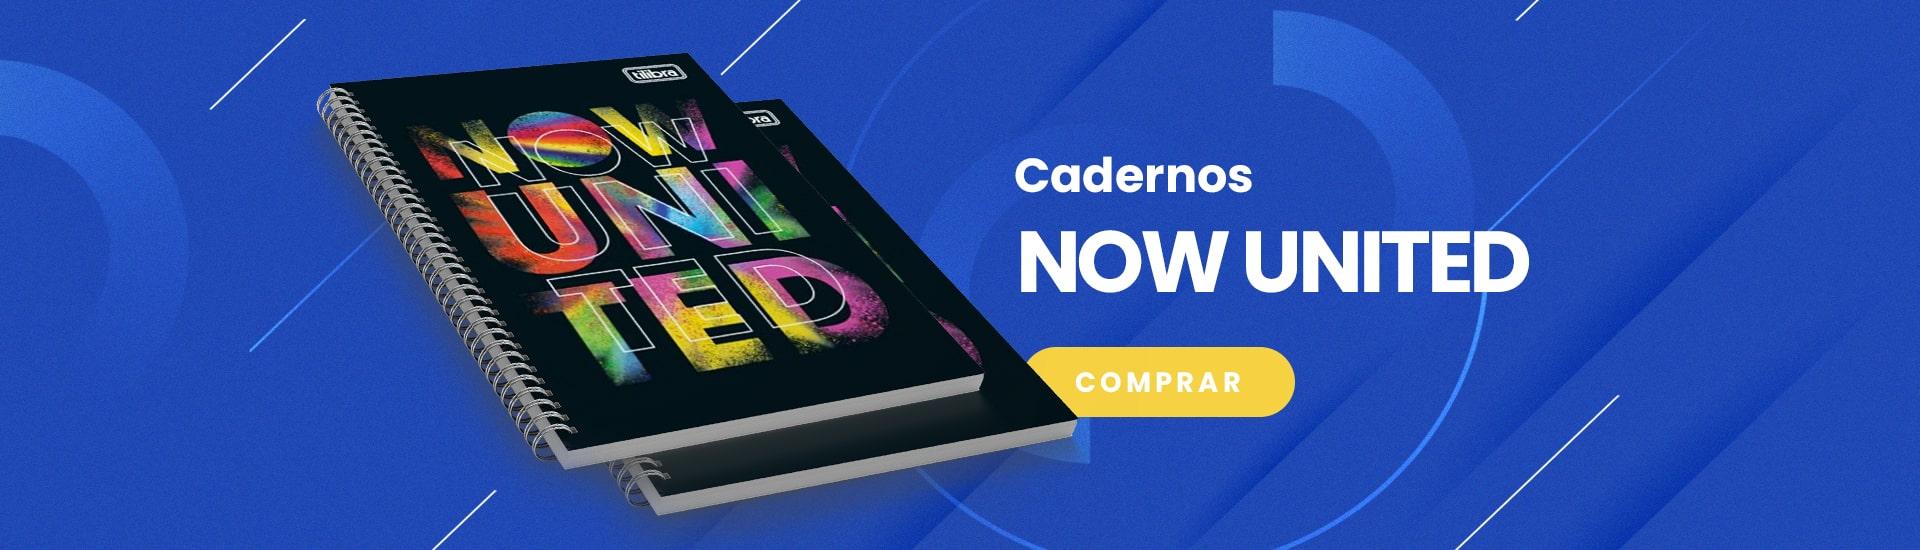 Cadernos Now United